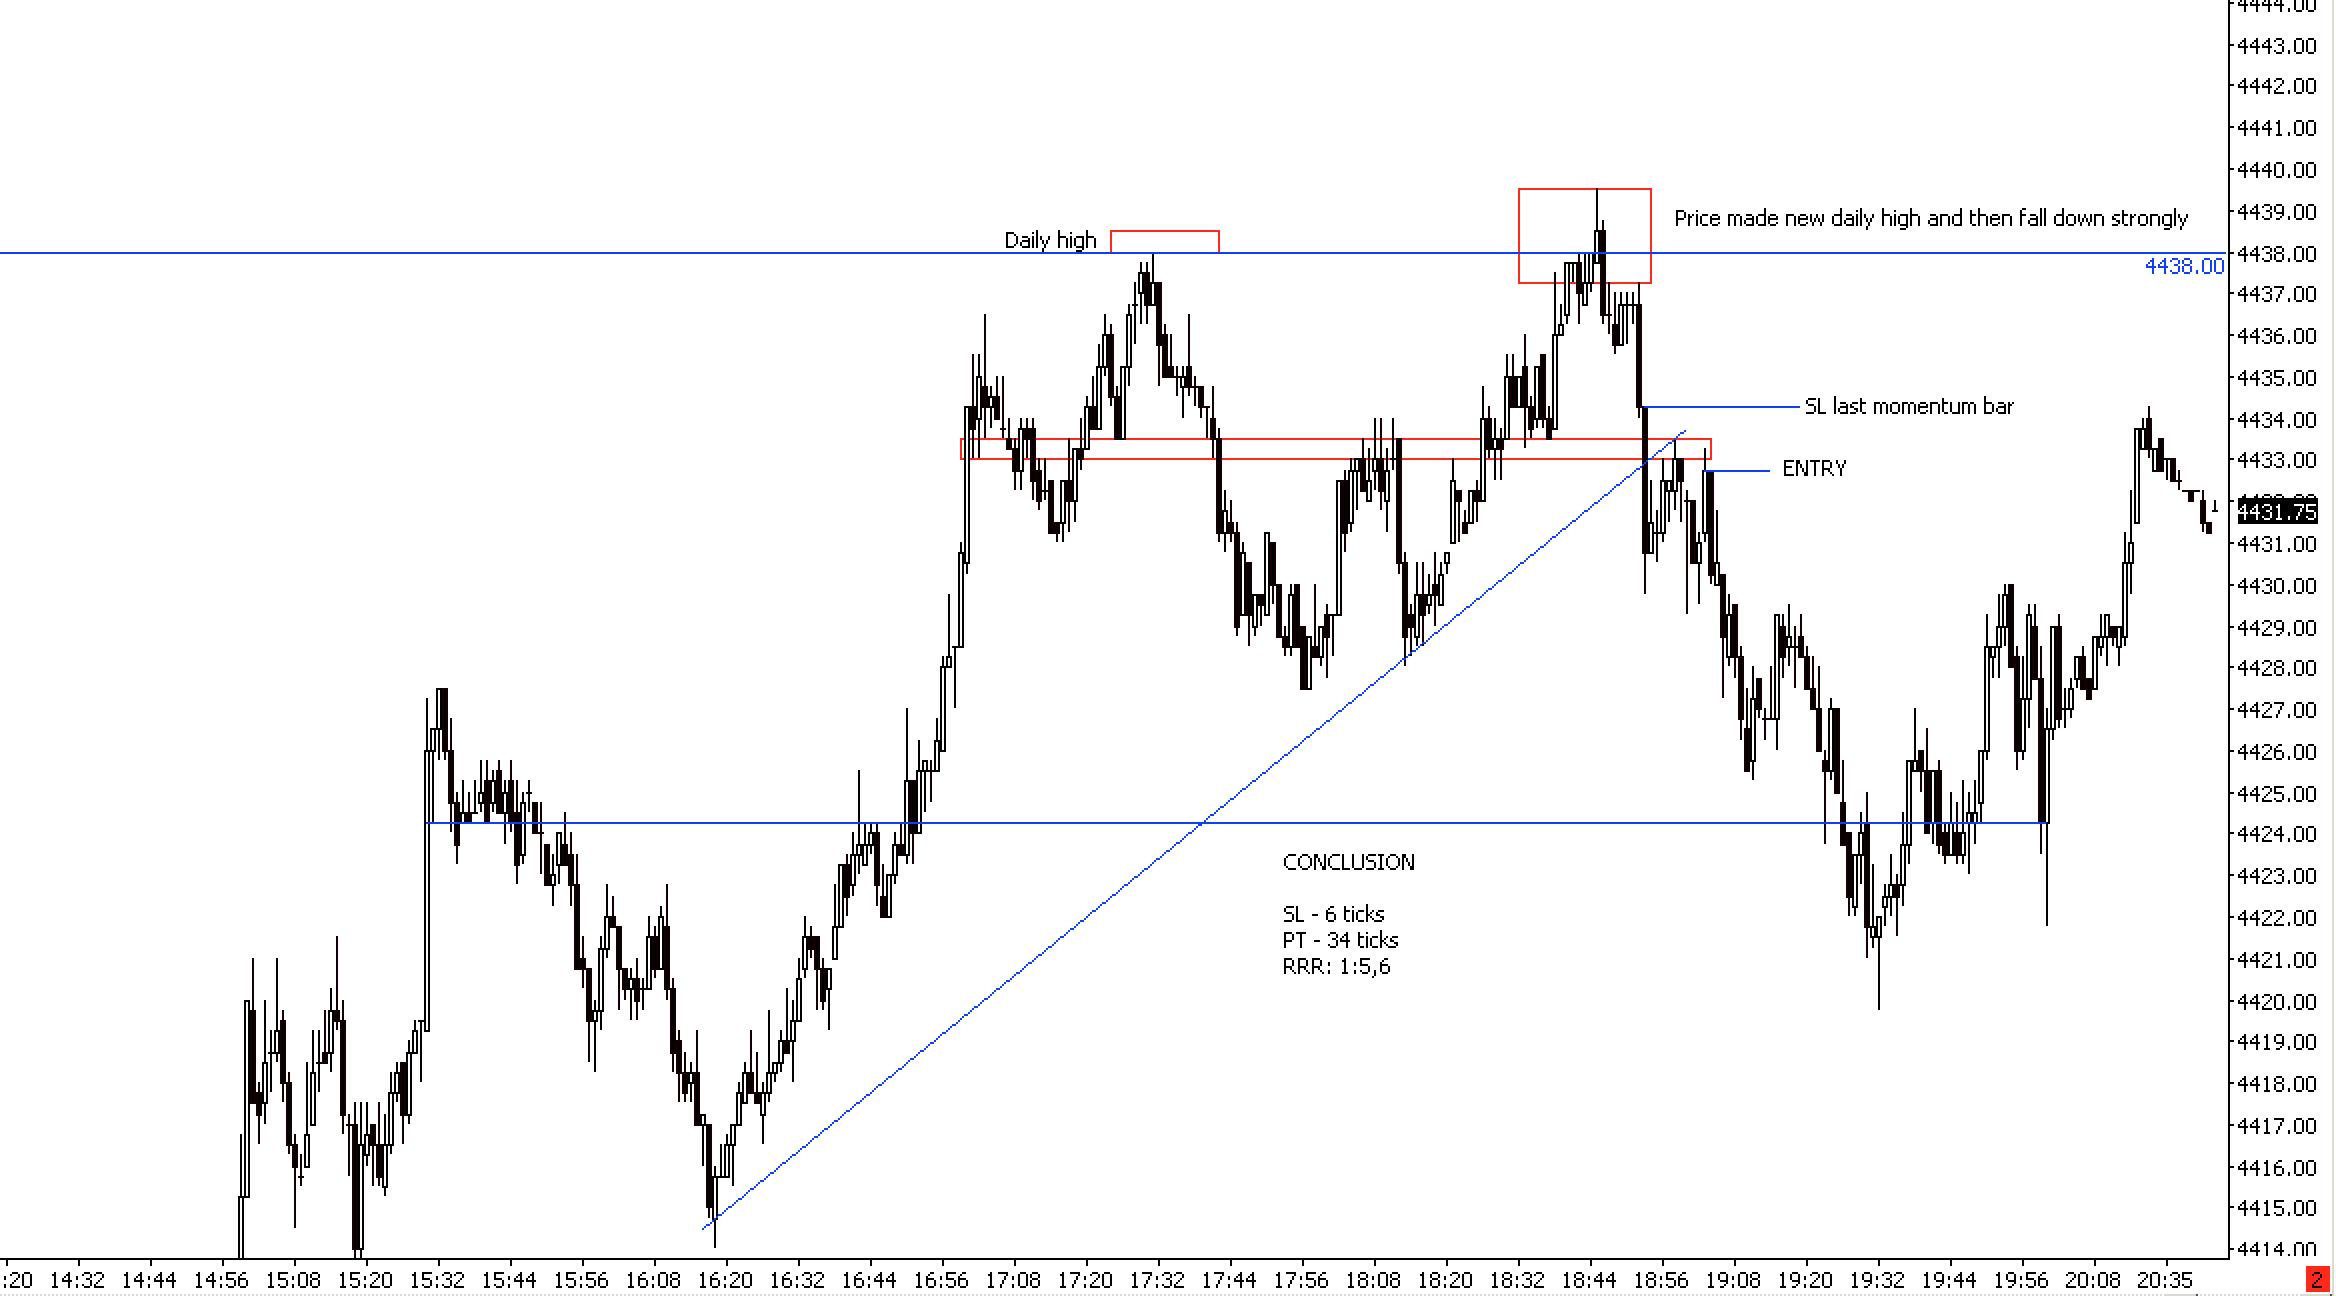 Forex trading price action patterns